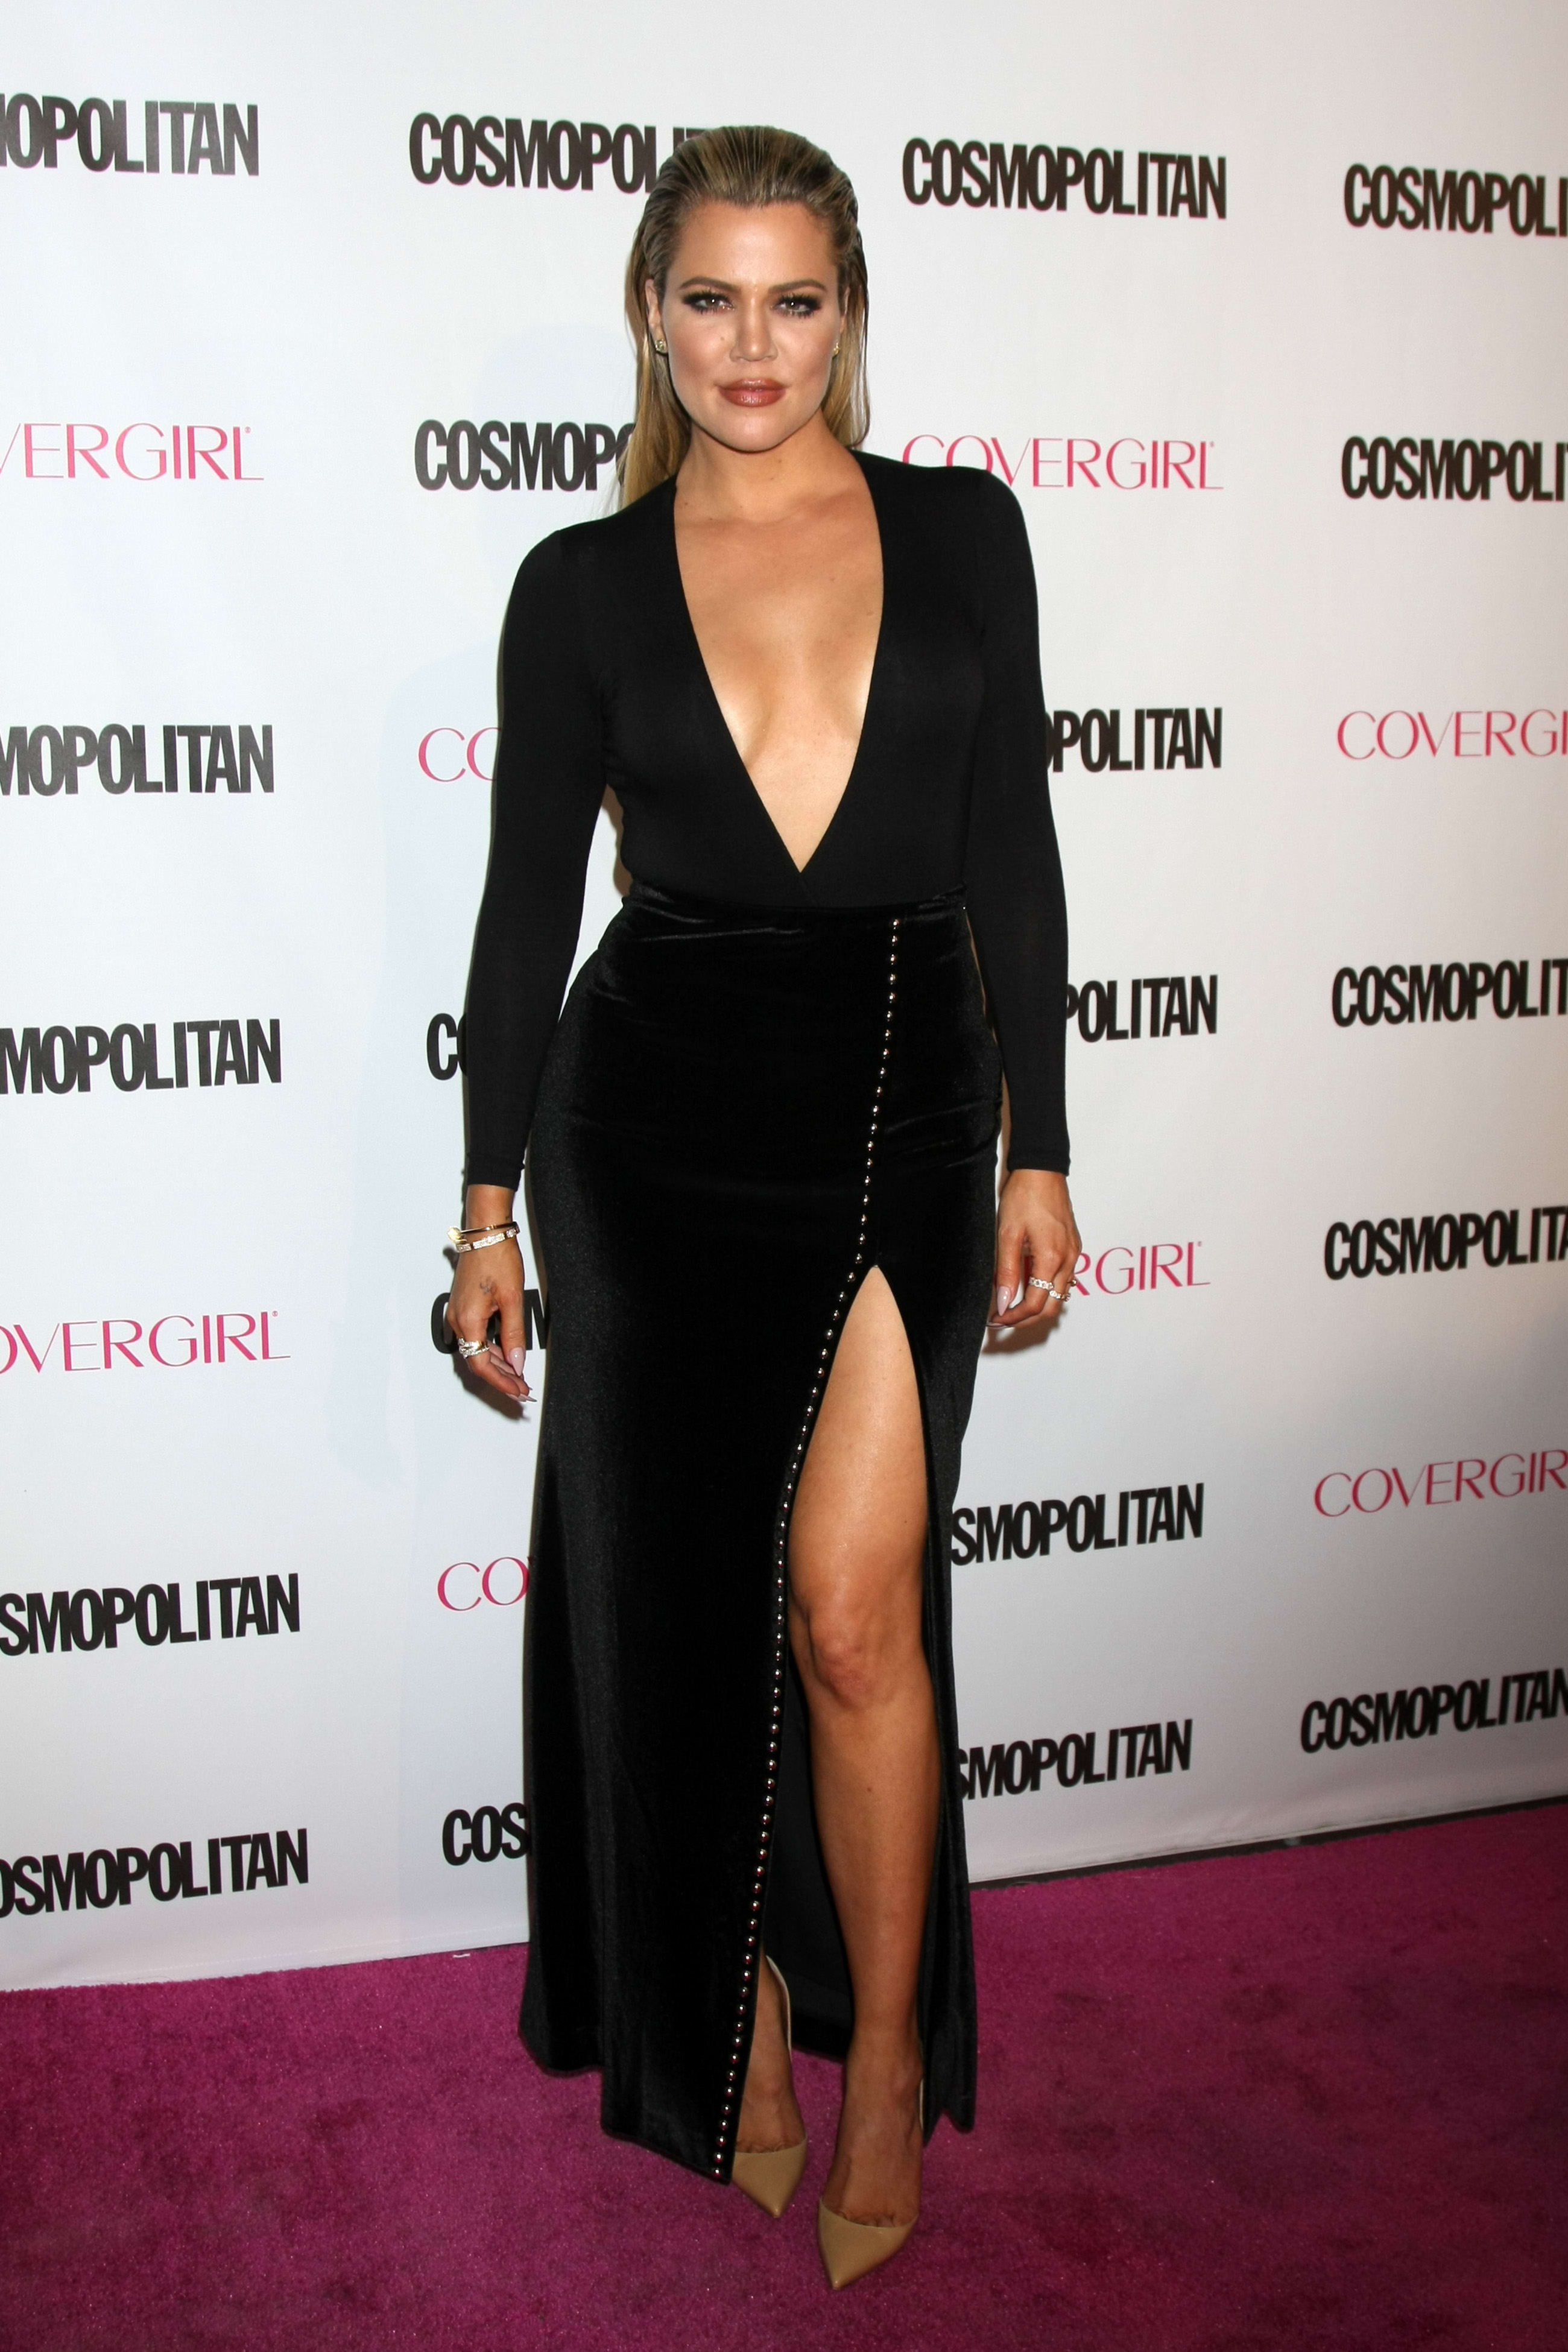 Khloe Kardashian I M Not The Fat Funny Sister Hollywood Gossip